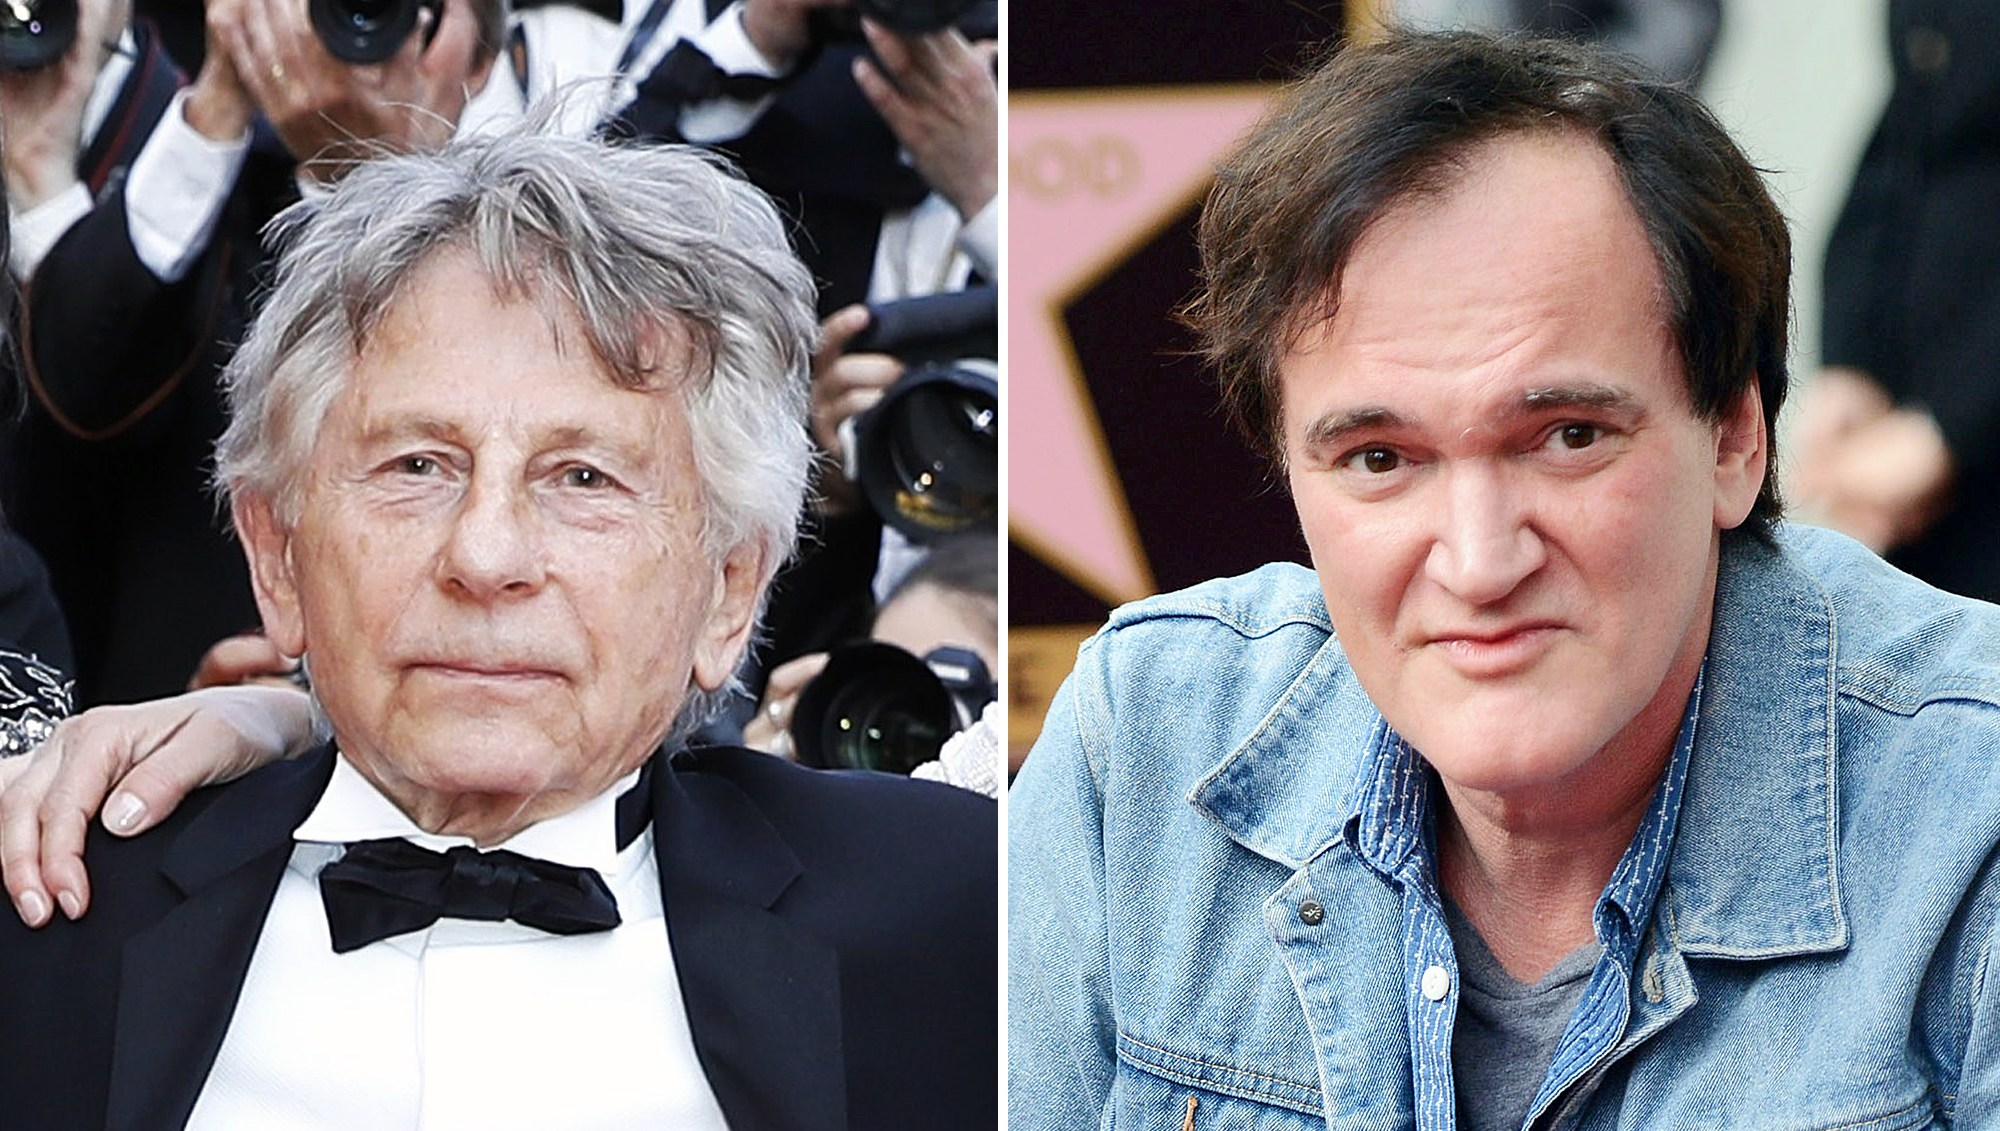 Roman Polanksi Quentin Tarantino